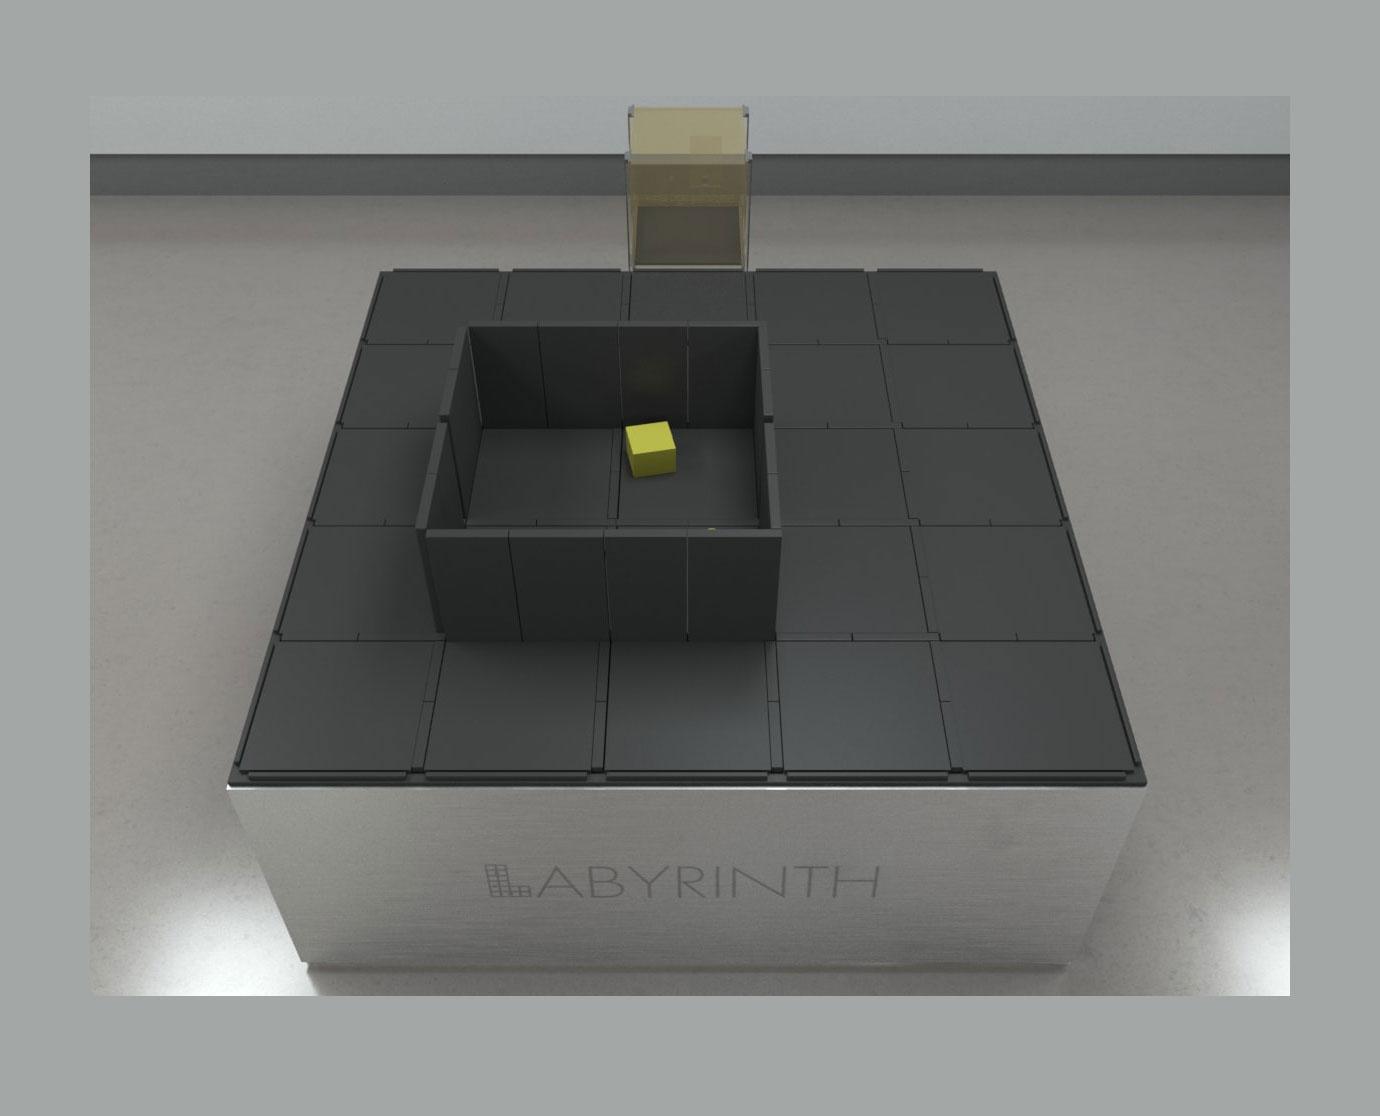 Labyrinth NOR